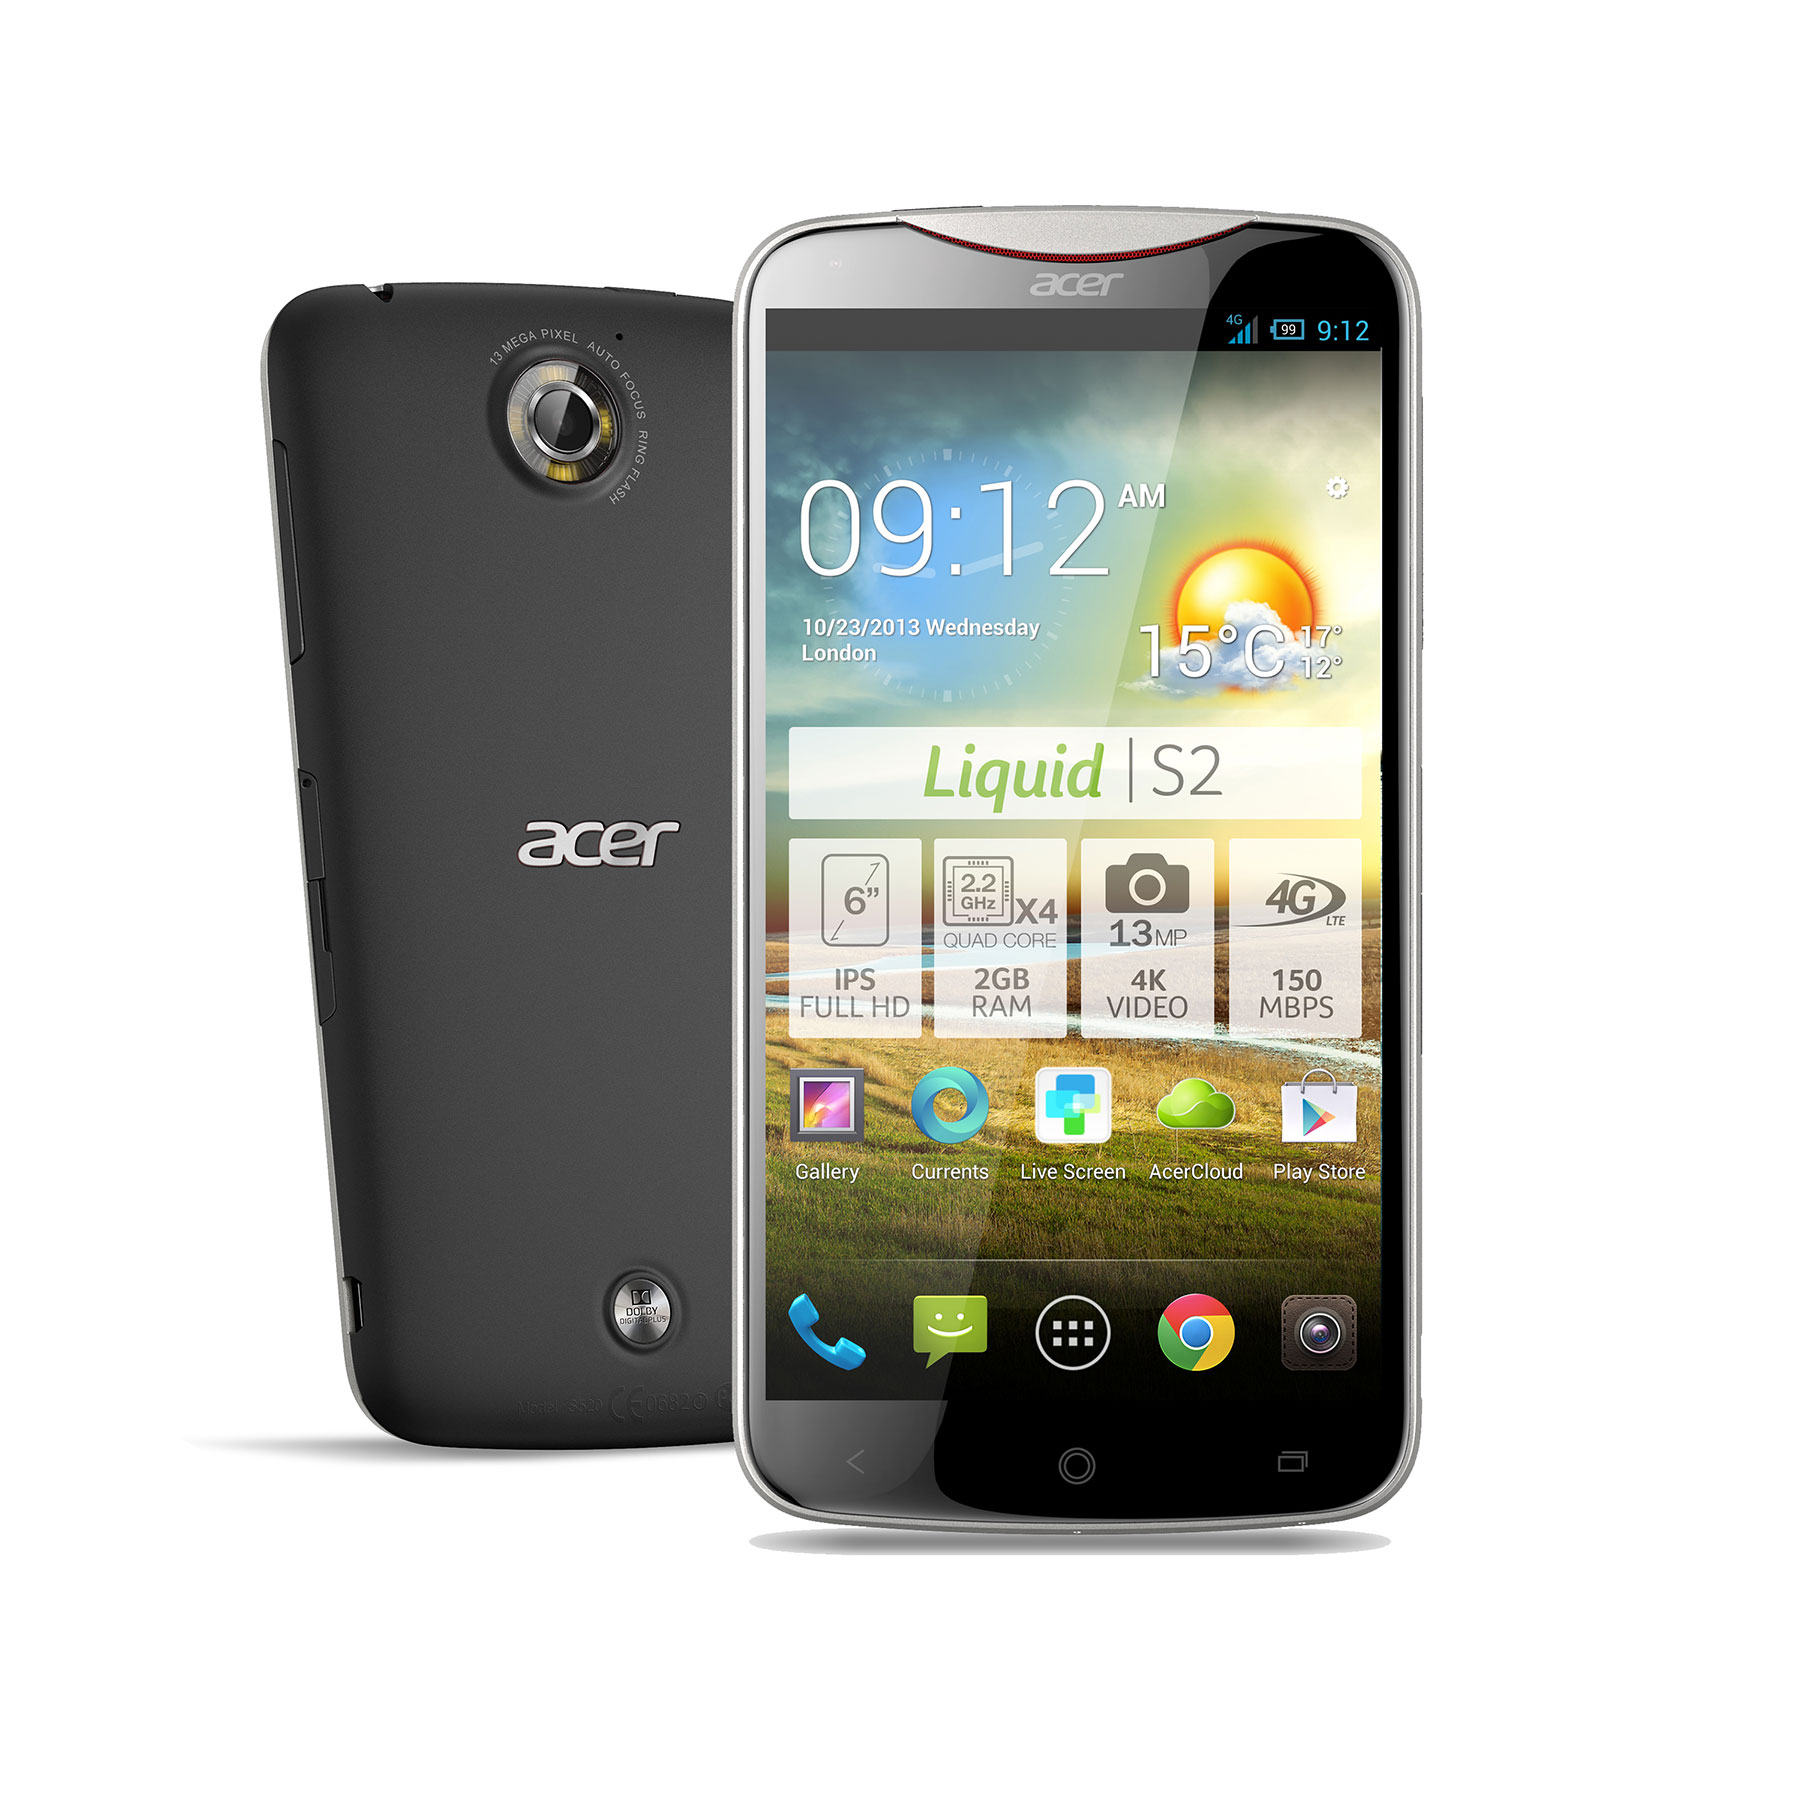 "Mobile & smartphone Acer Liquid S2 Rock Black Smartphone 4G-LTE avec écran tactile Full HD 6"" sous Android 4.2"